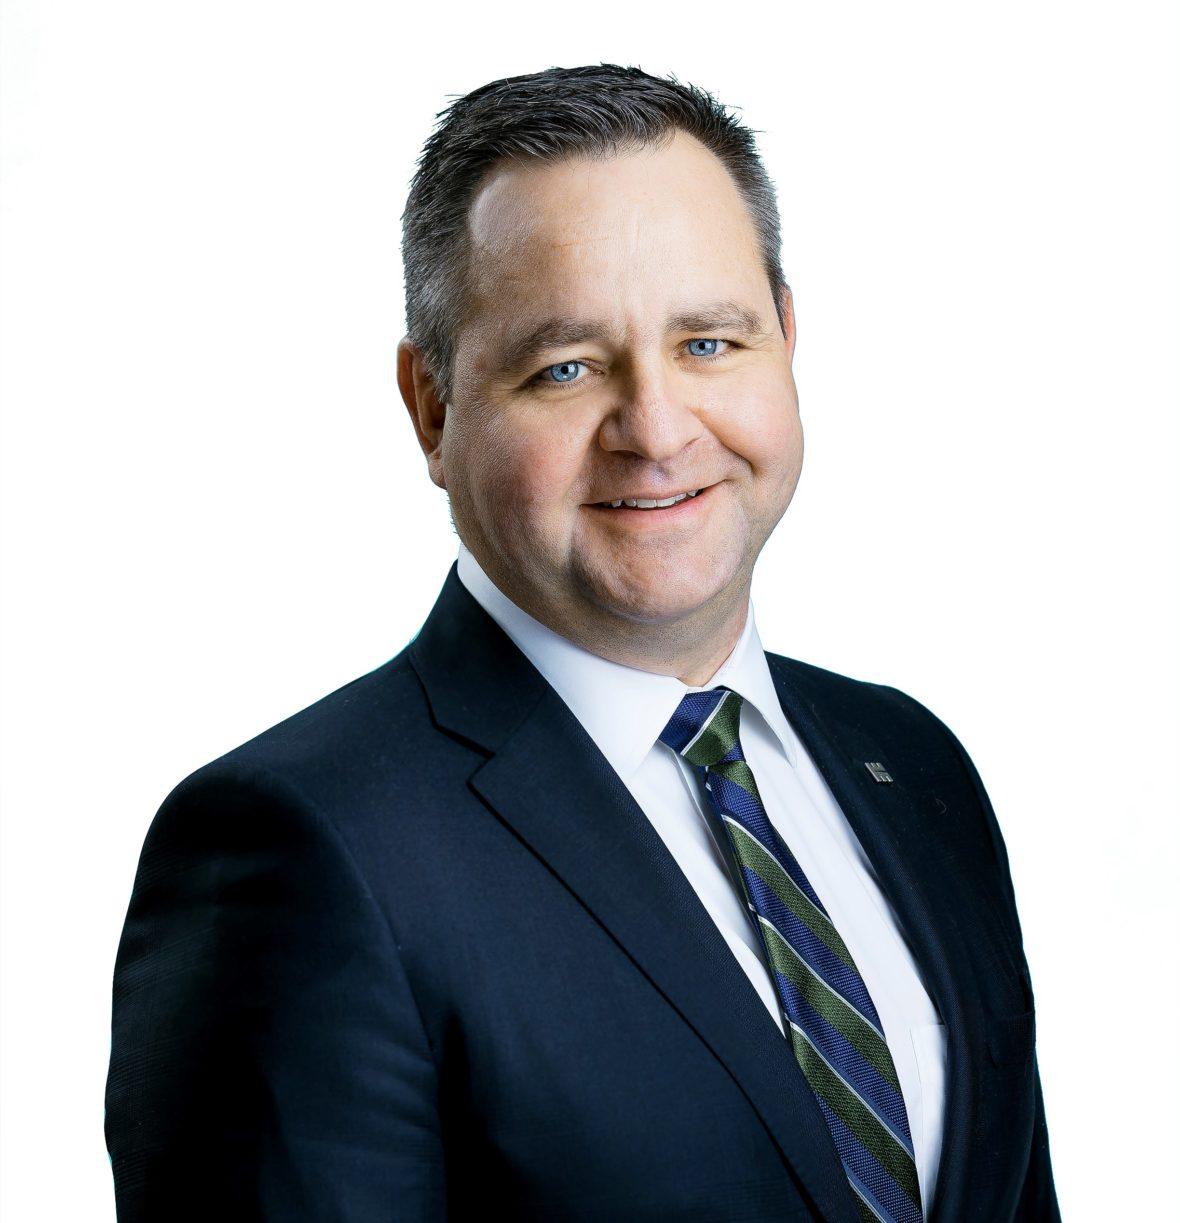 Styrelseordförande Mikael Vatn.